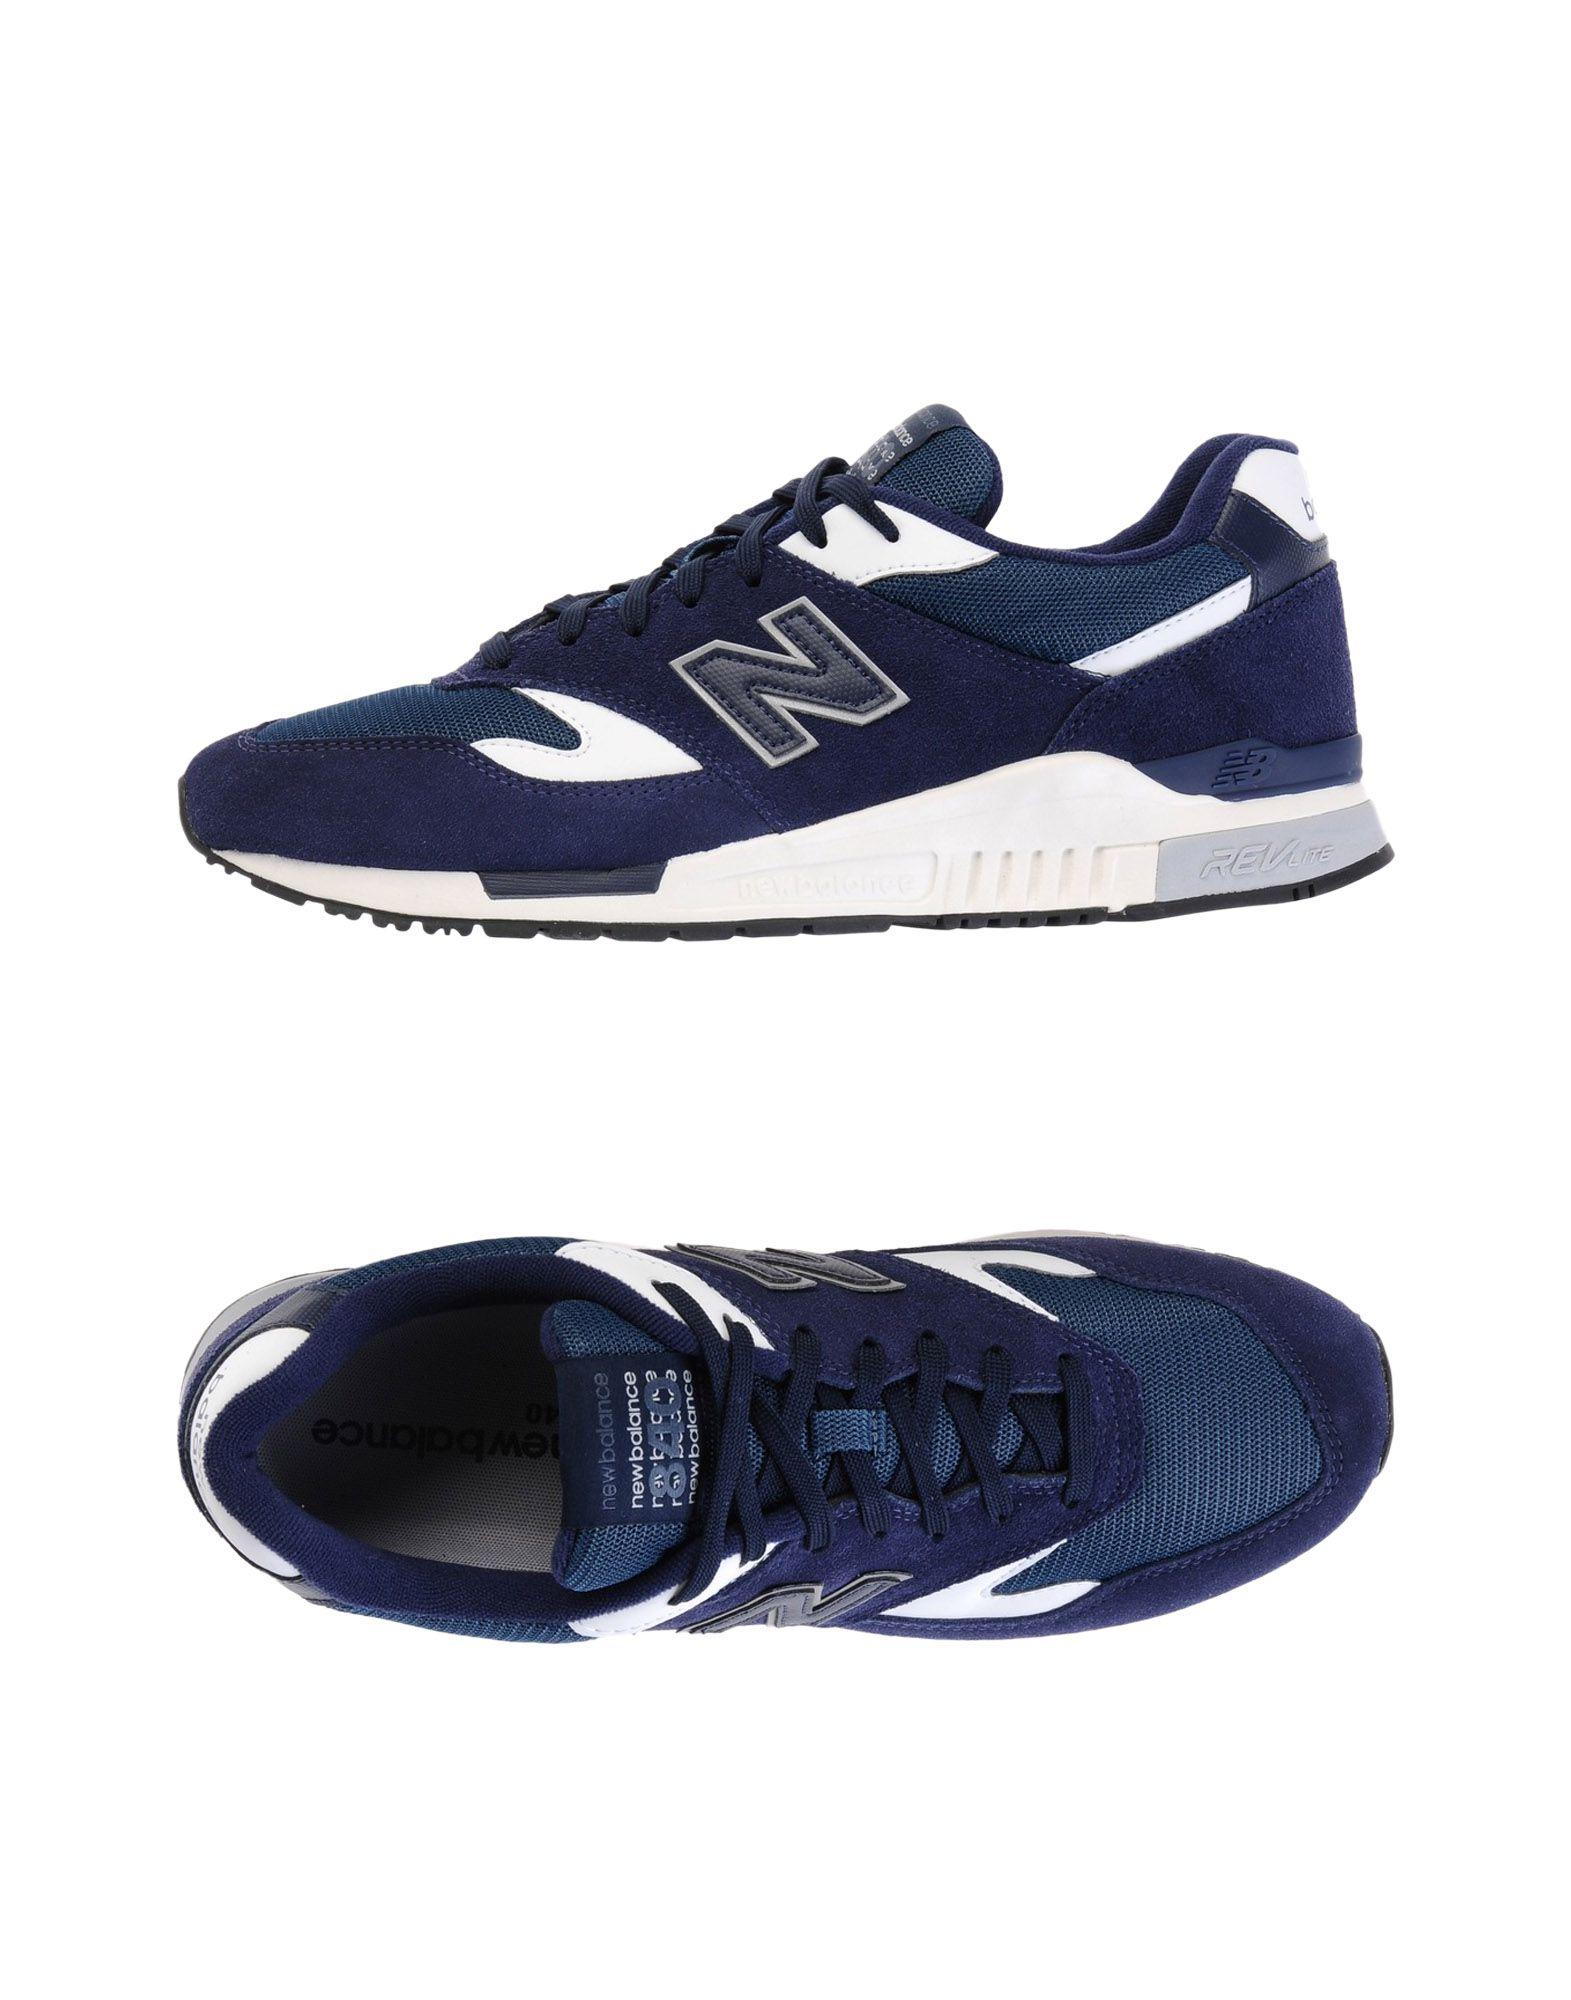 Sneakers New Balance 840 90S Running - Donna - Acquista online su